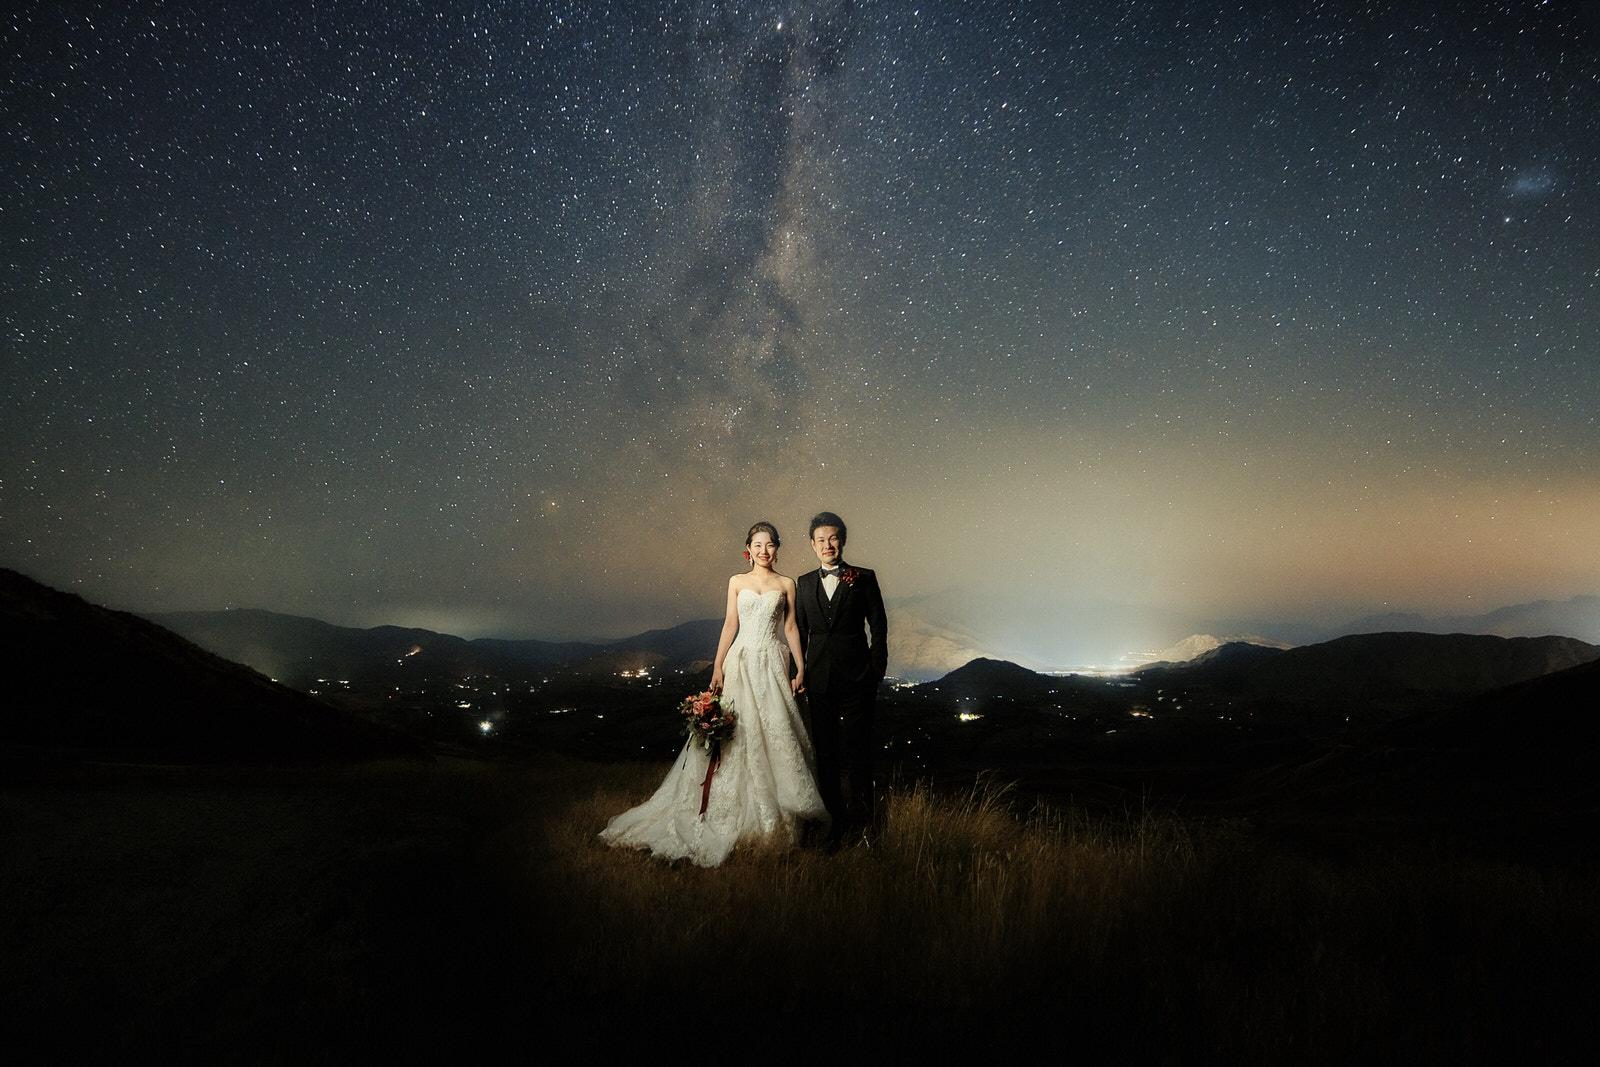 Queenstown Night Wedding